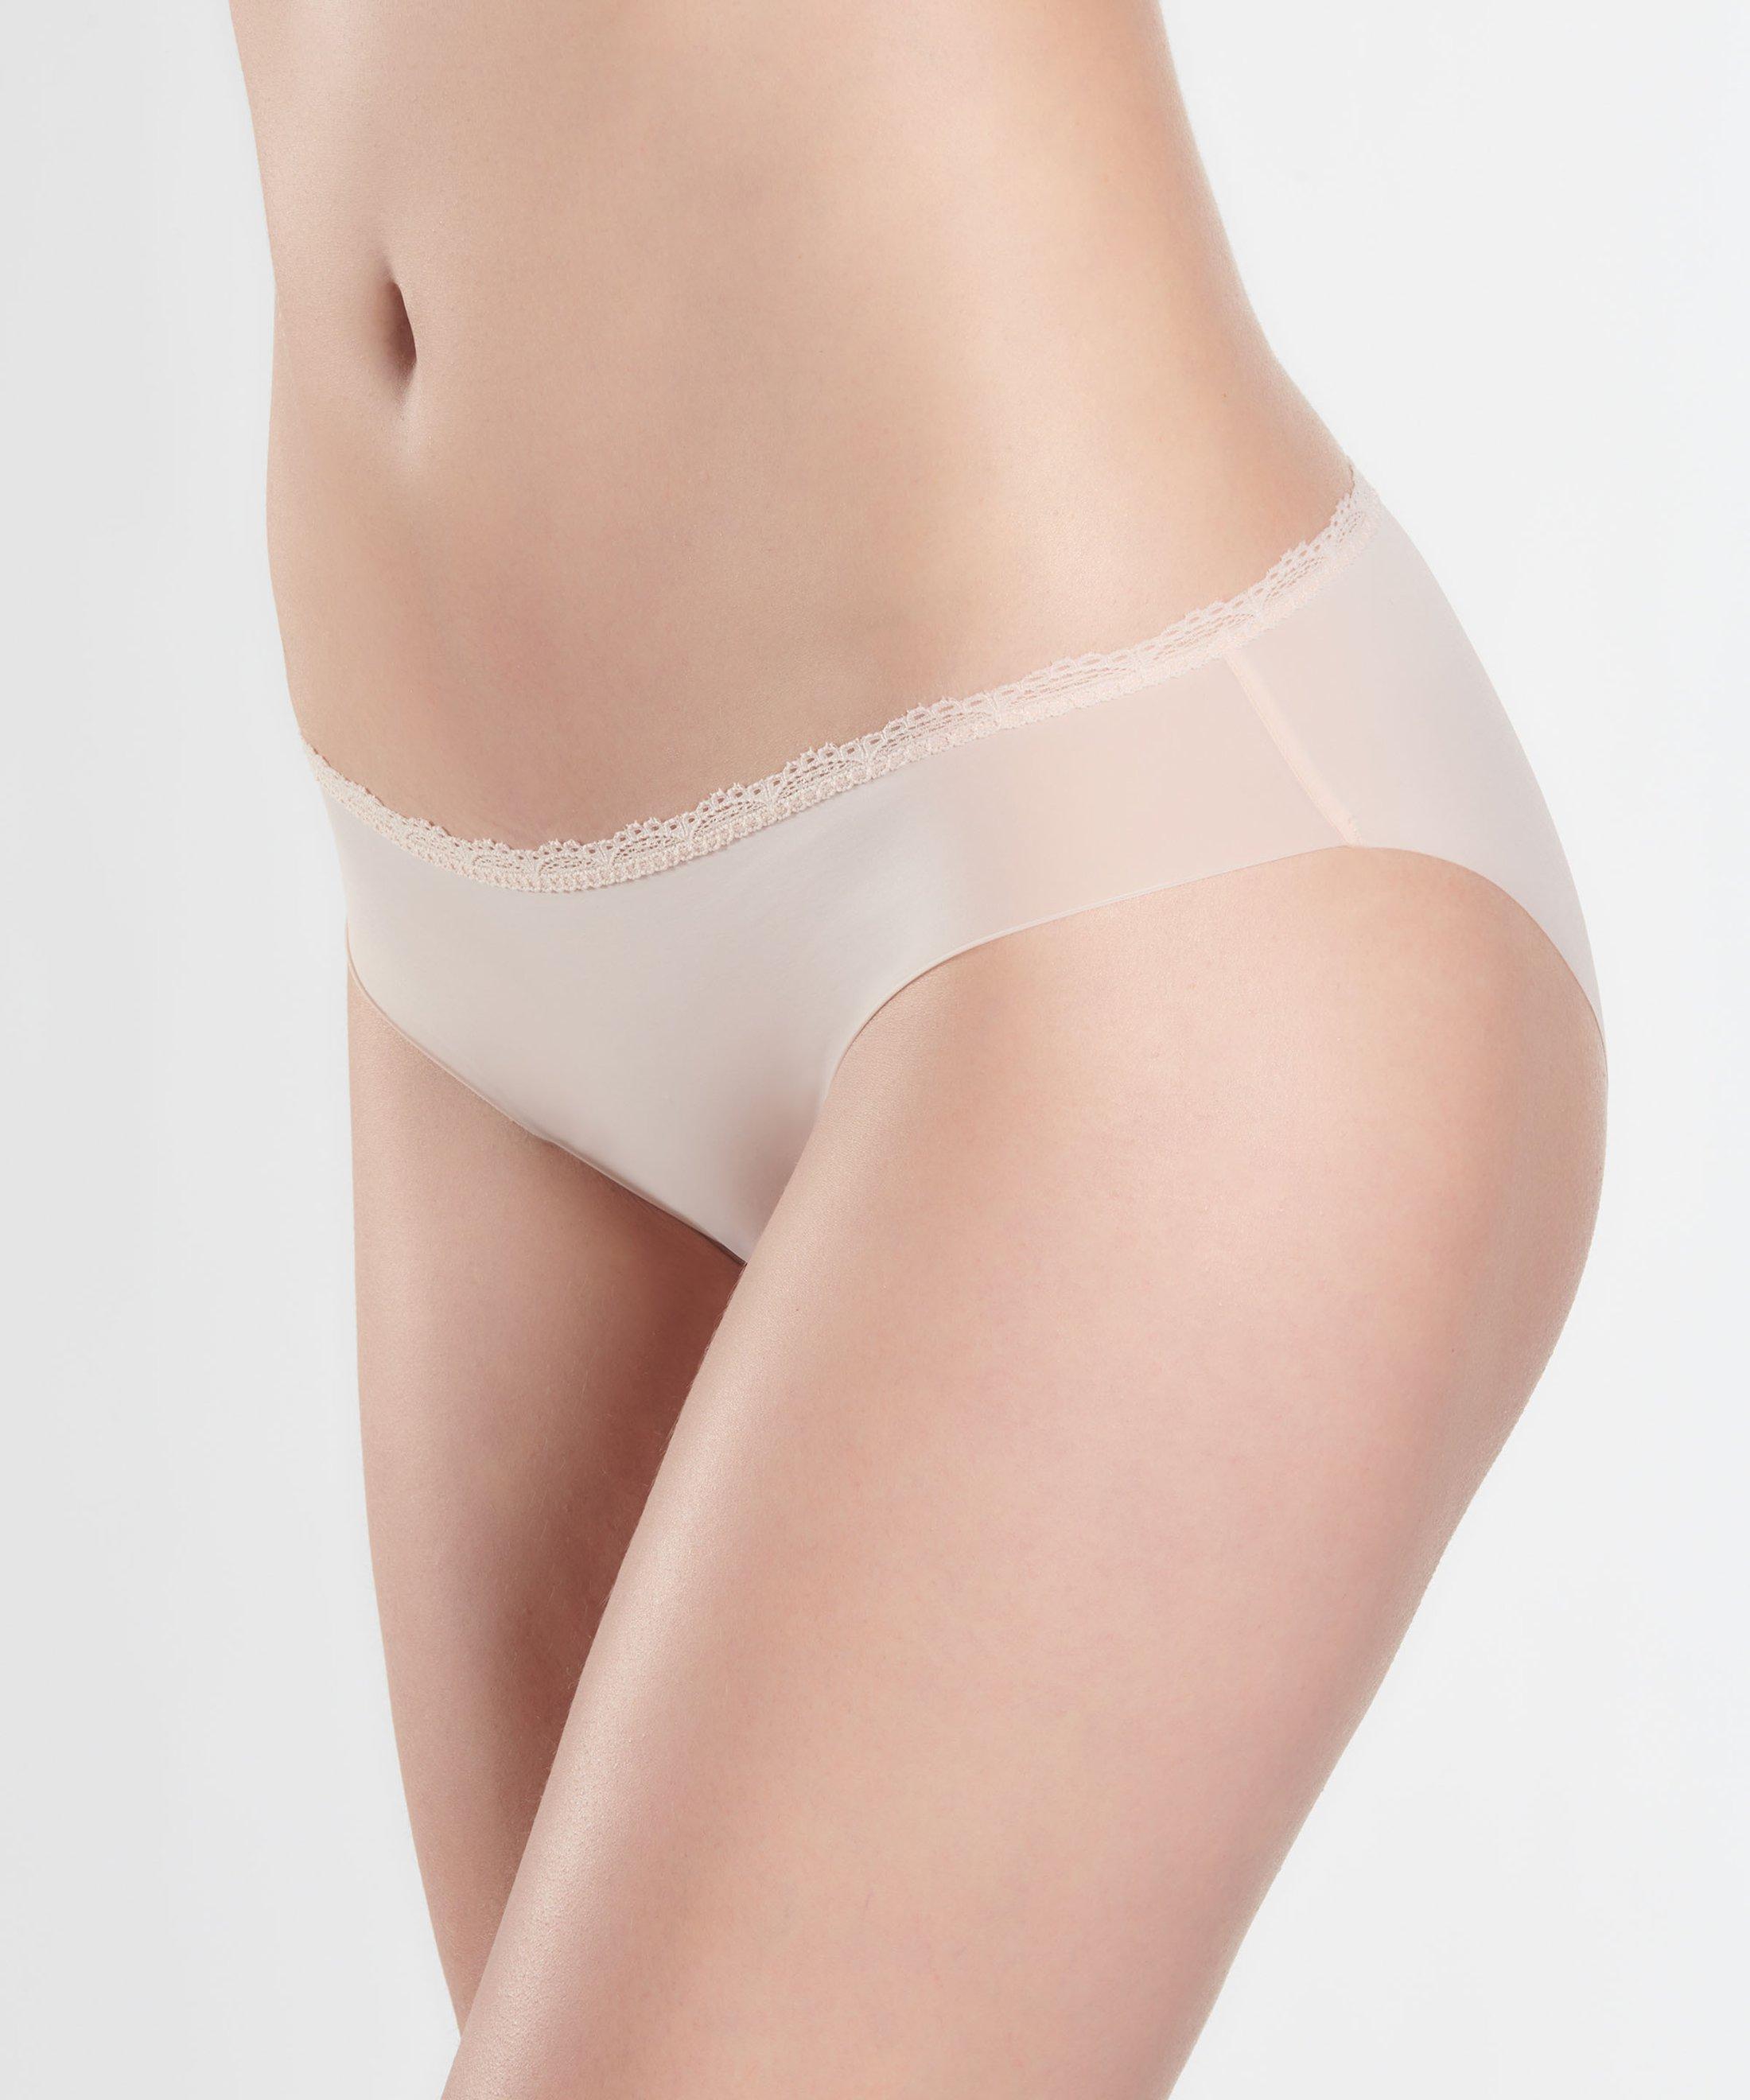 LYSESSENCE Brazilian brief Nude d'Été | Aubade